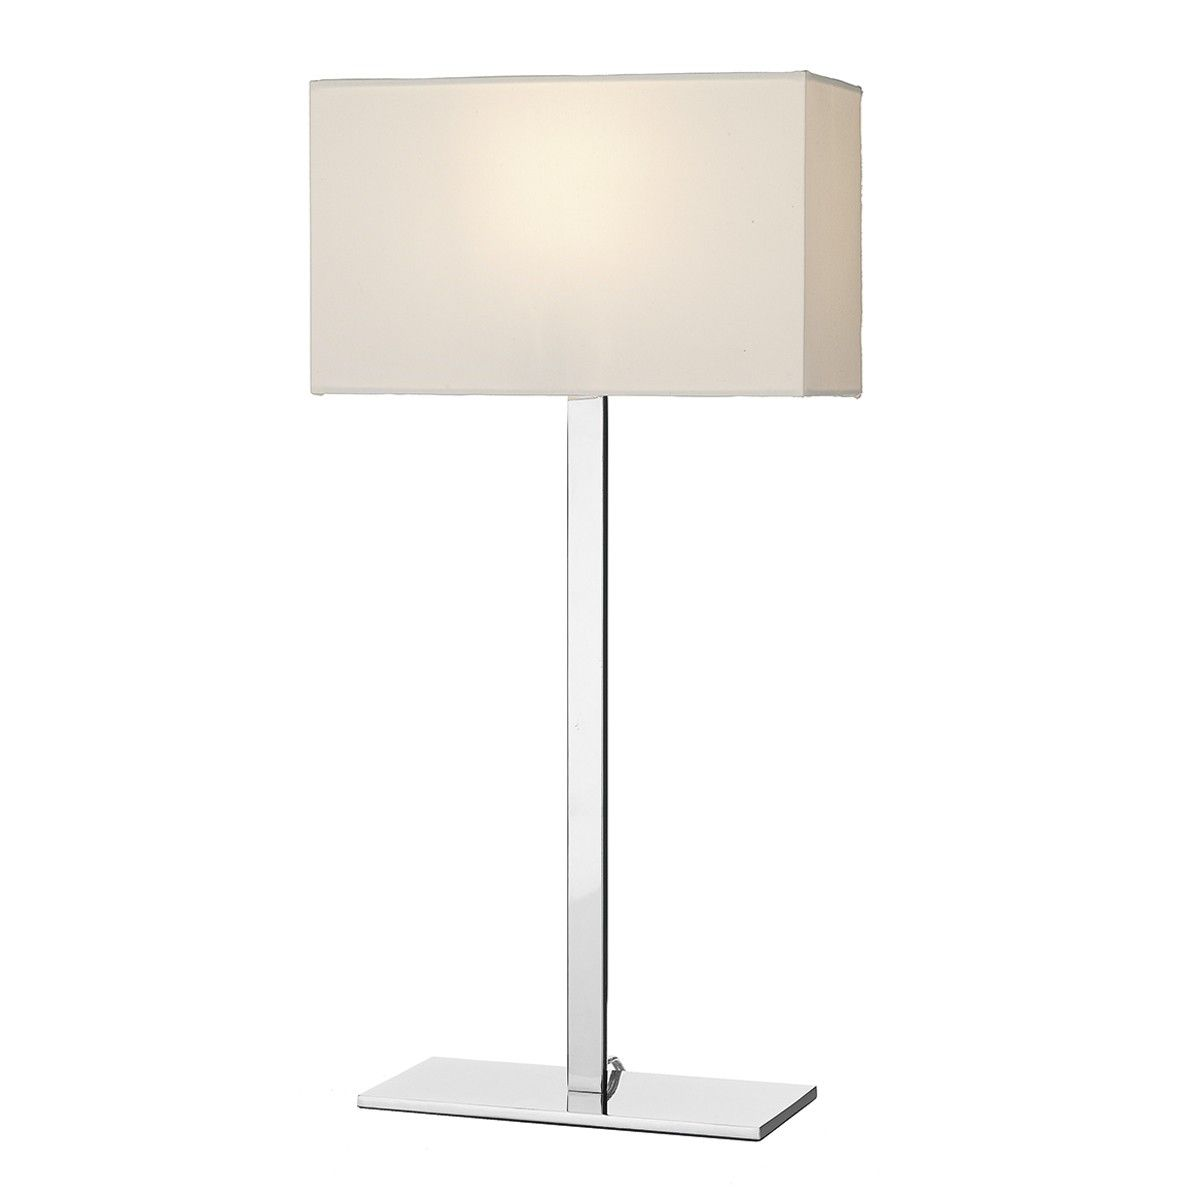 Dar lighting tri4250 trieste table lamp polished chrome base only dar lighting tri4250 trieste table lamp polished chrome base only aloadofball Images